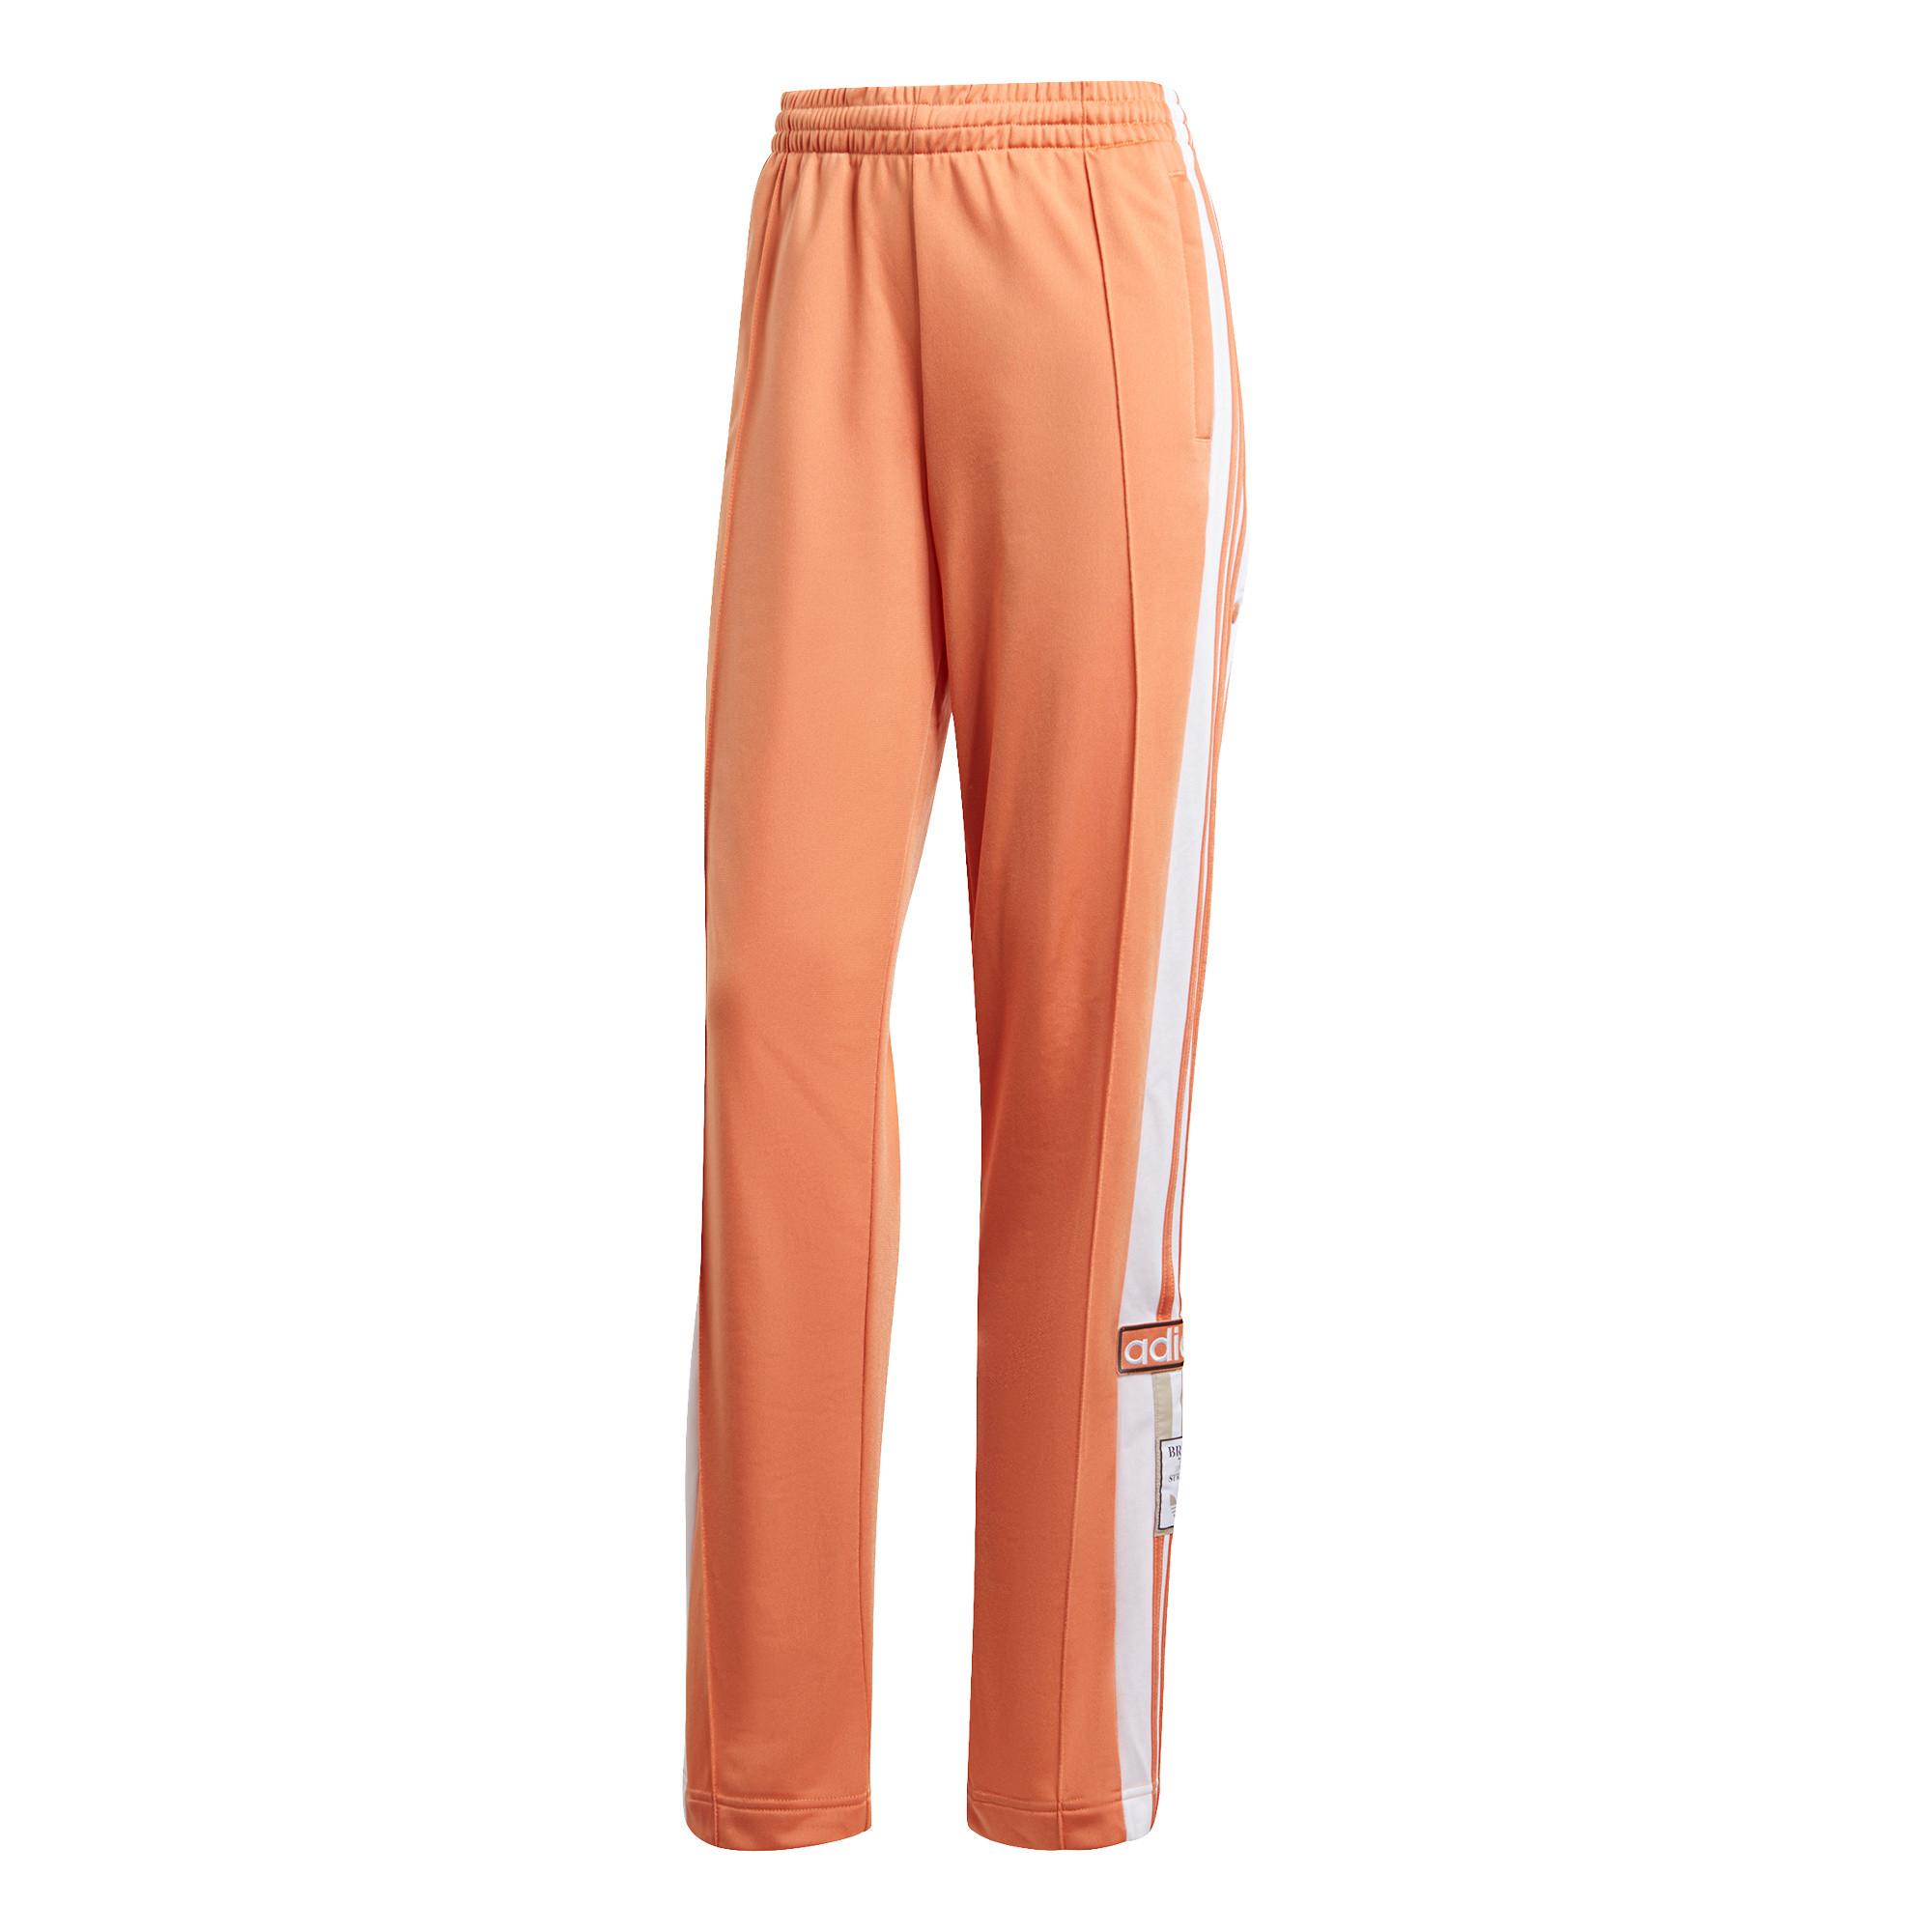 Pantaloni tuta adicolor Classics adibreak, Marrone bronzo, large image number 0